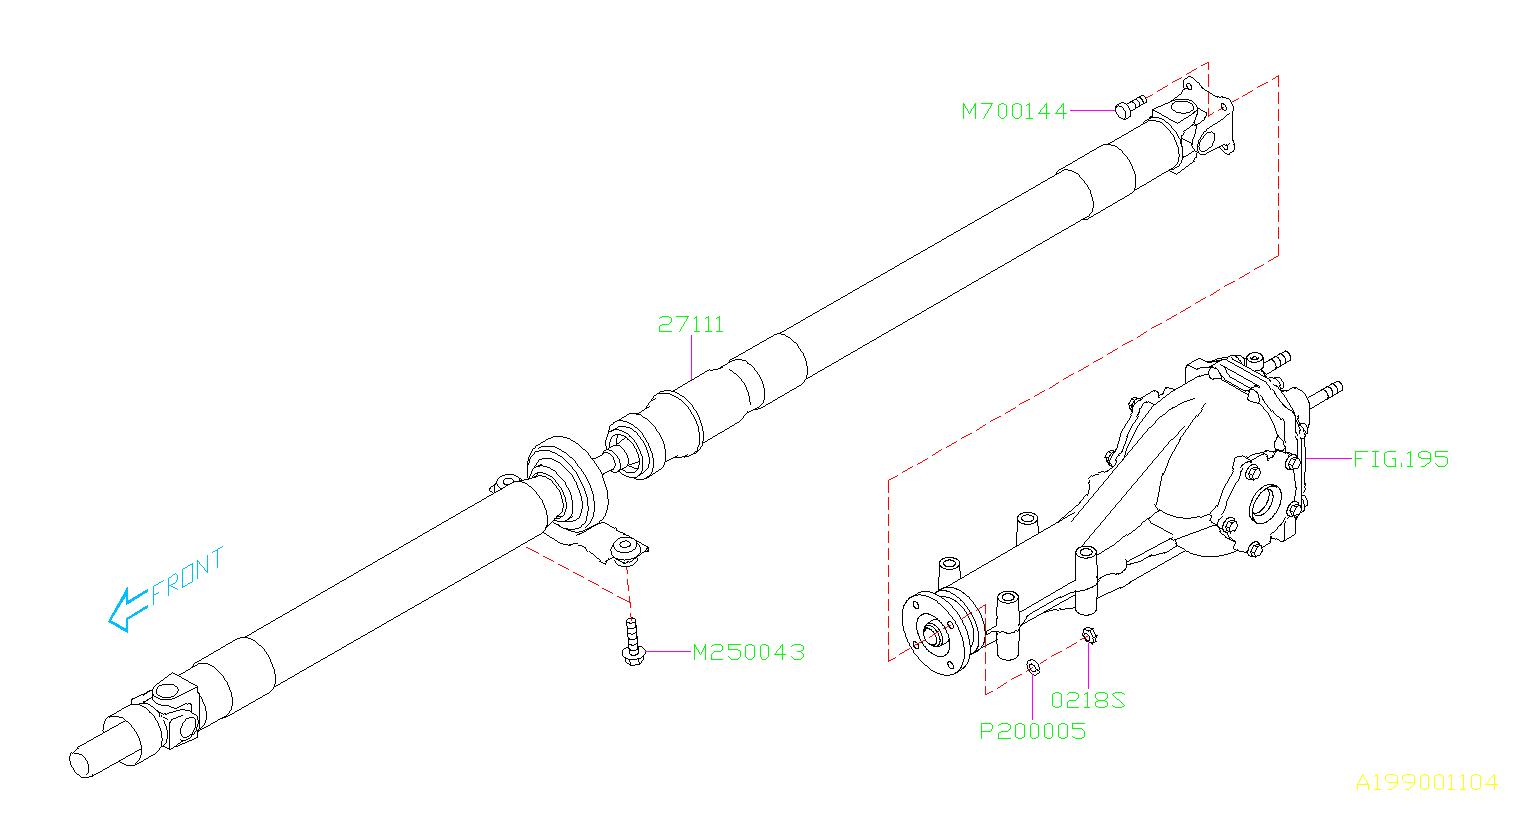 Subaru STI Bolt & washer assembly. Shaft, propeller